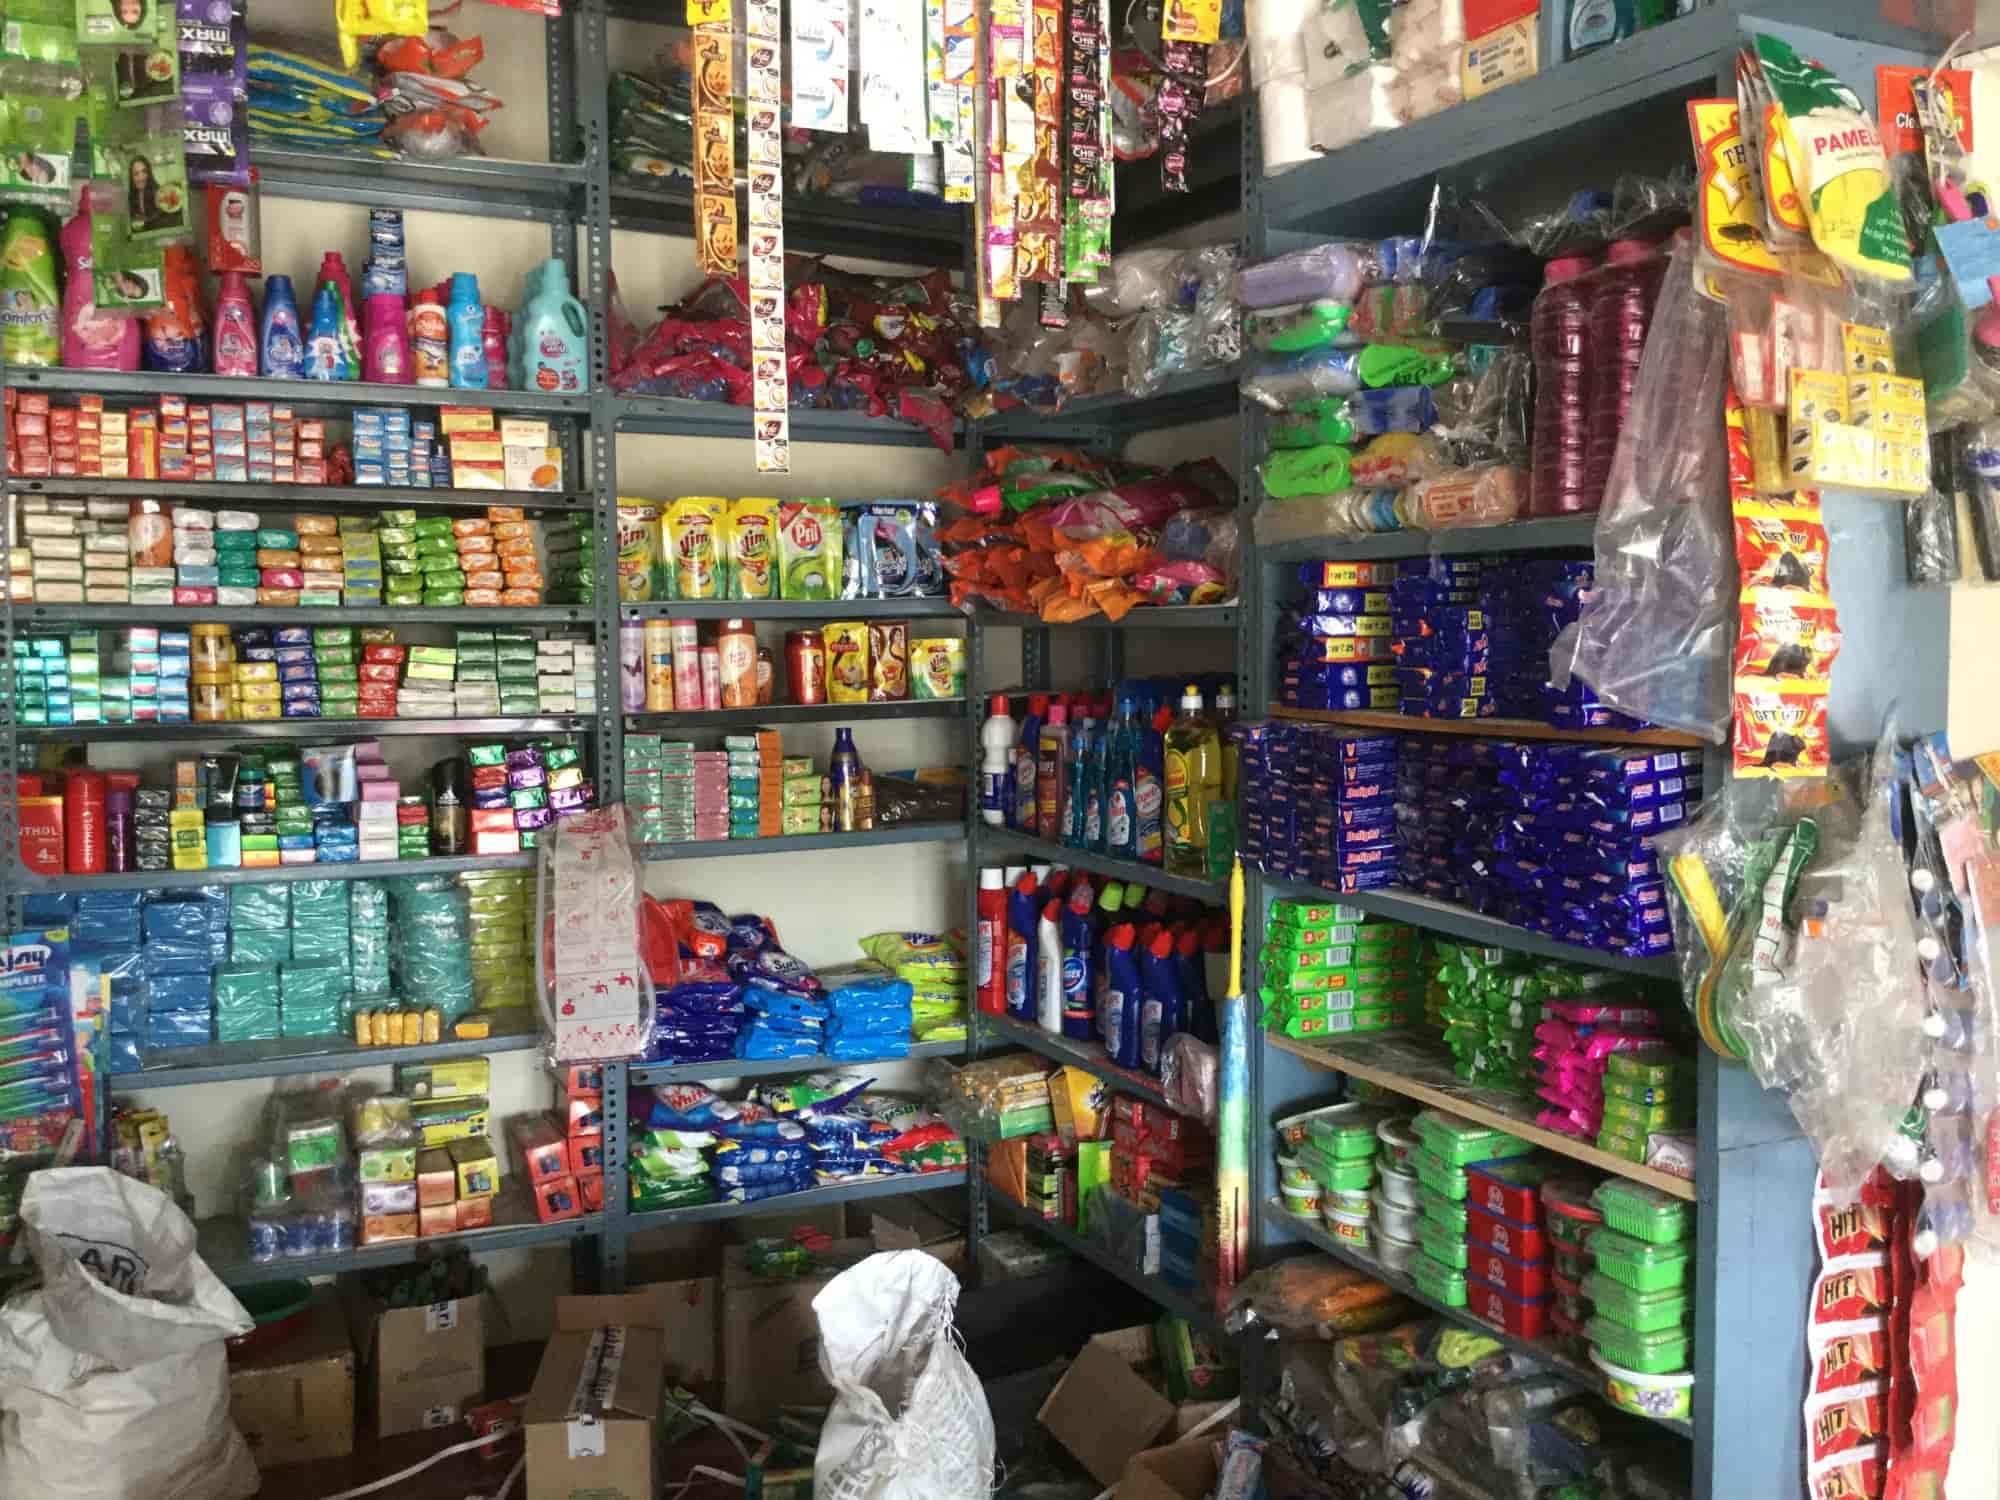 Rahul Product Photos, Urapakkam, Chengalpattu- Pictures & Images